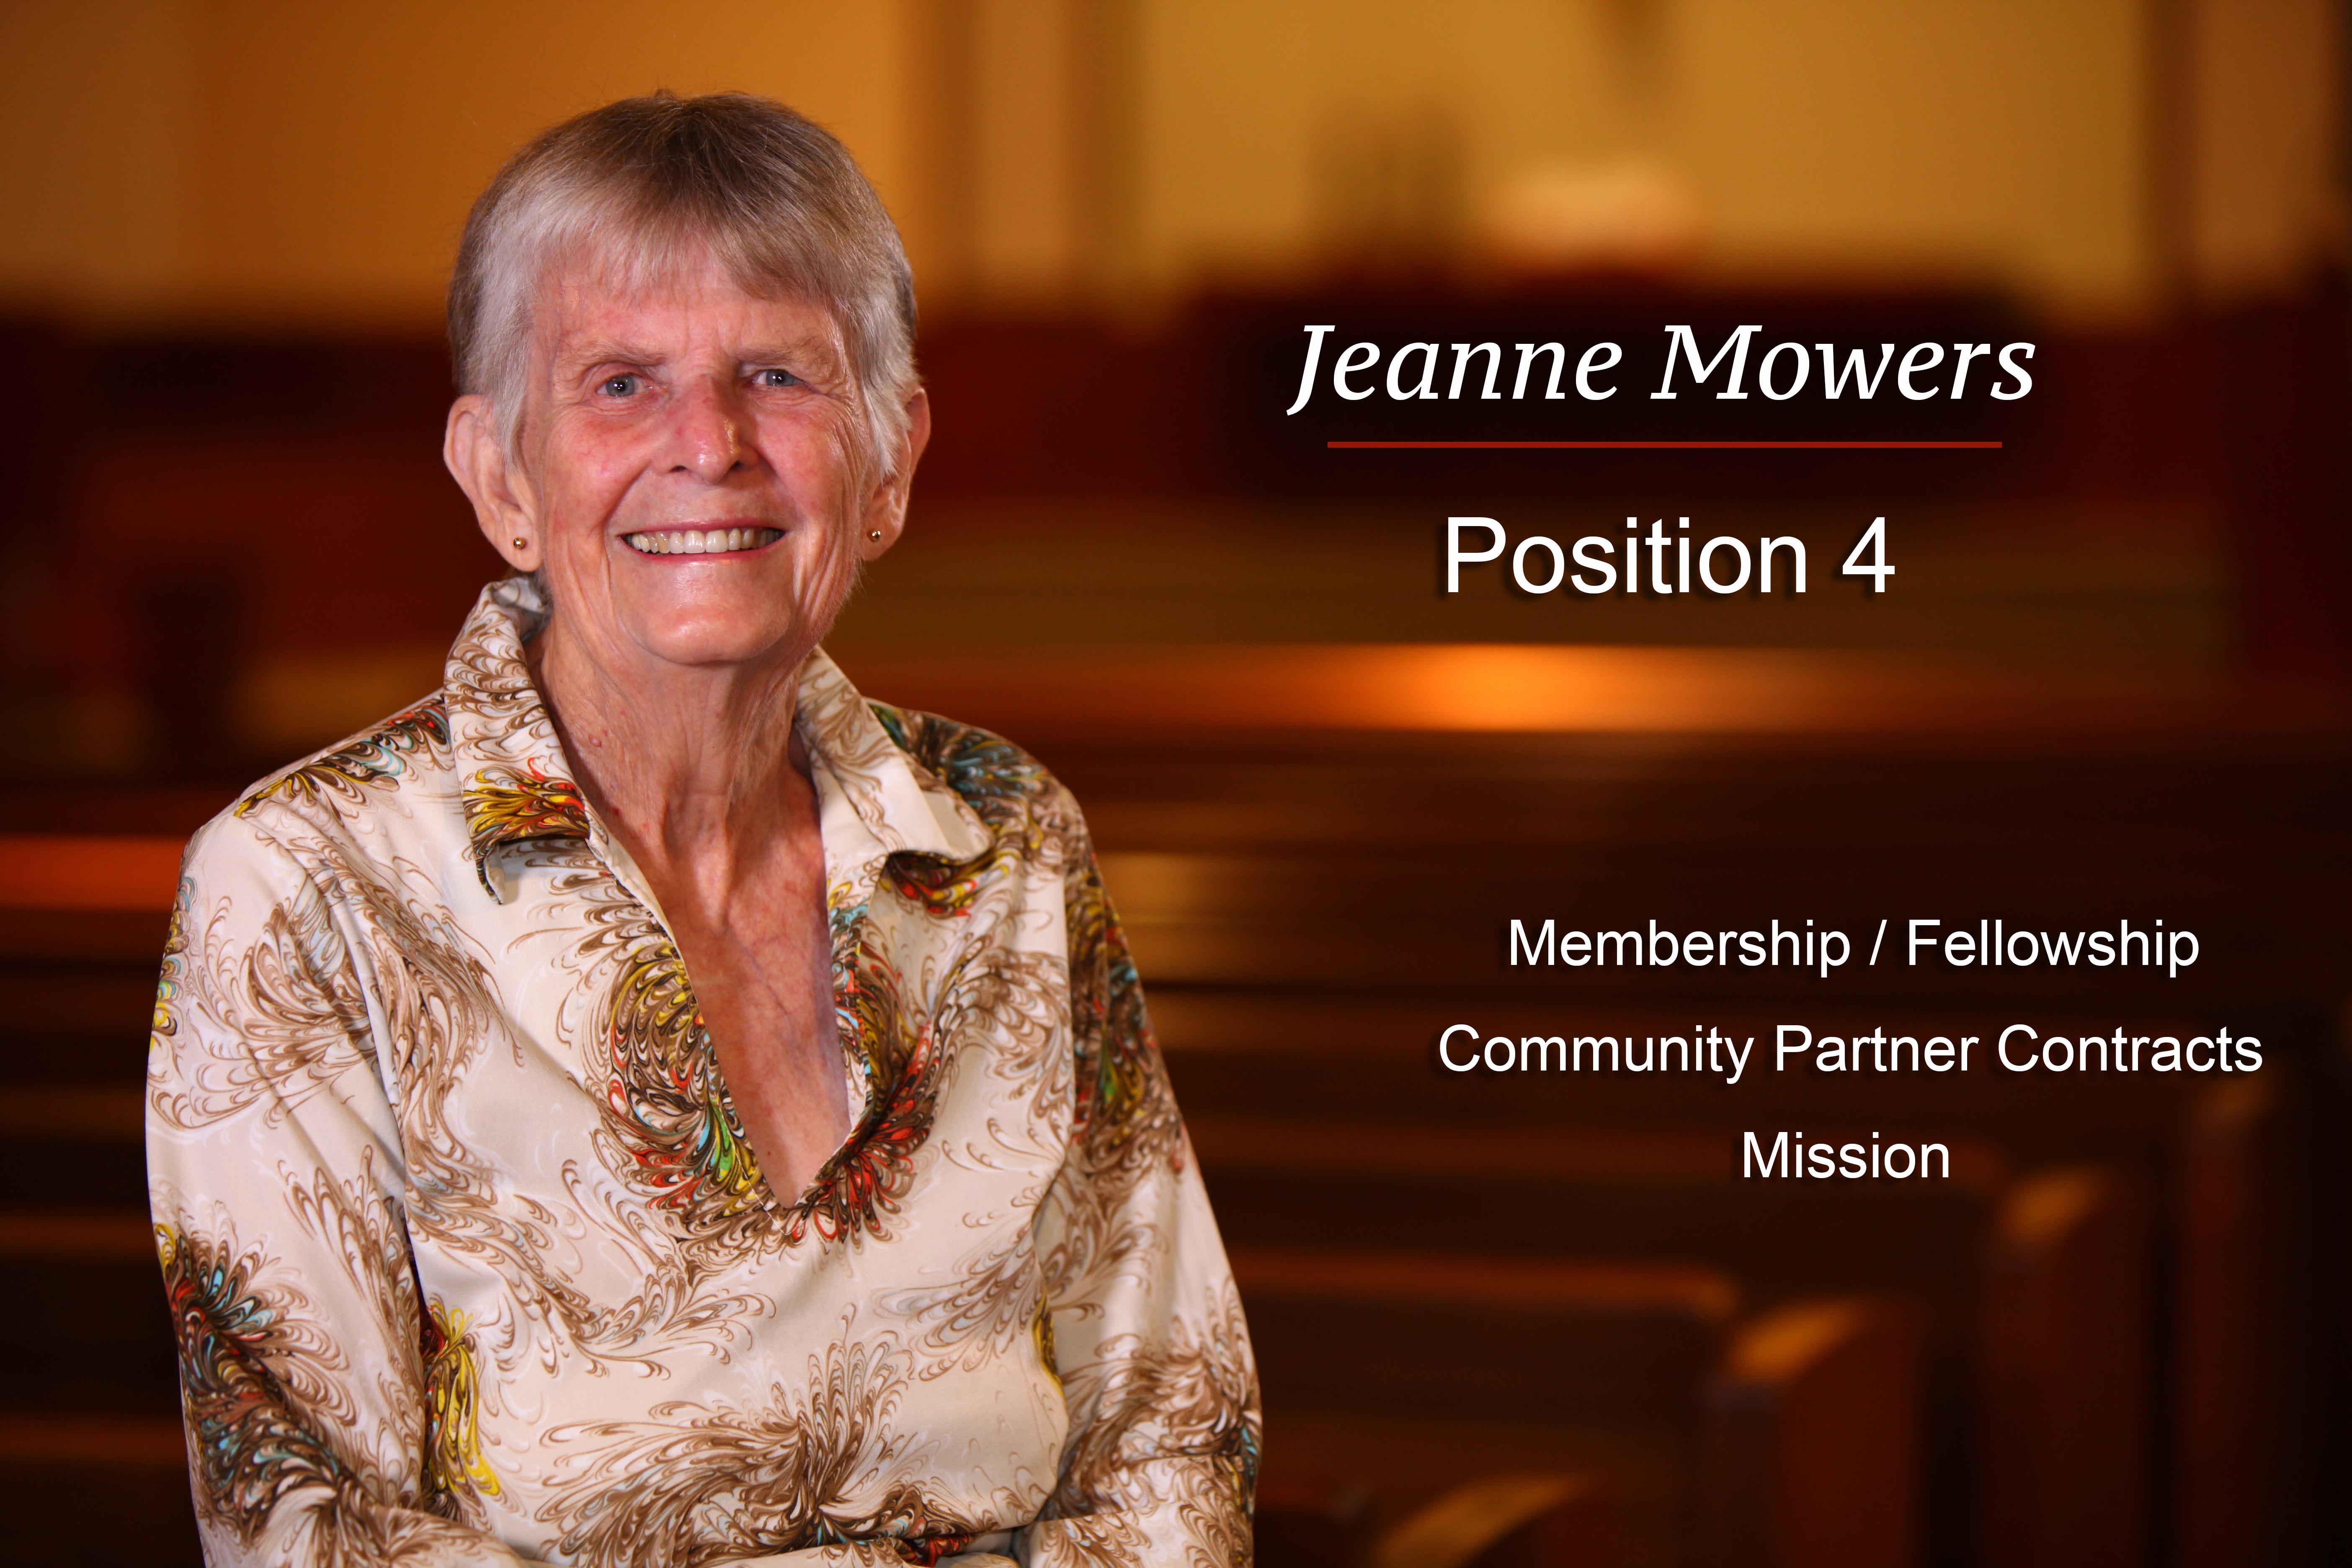 Jeanne Mowers